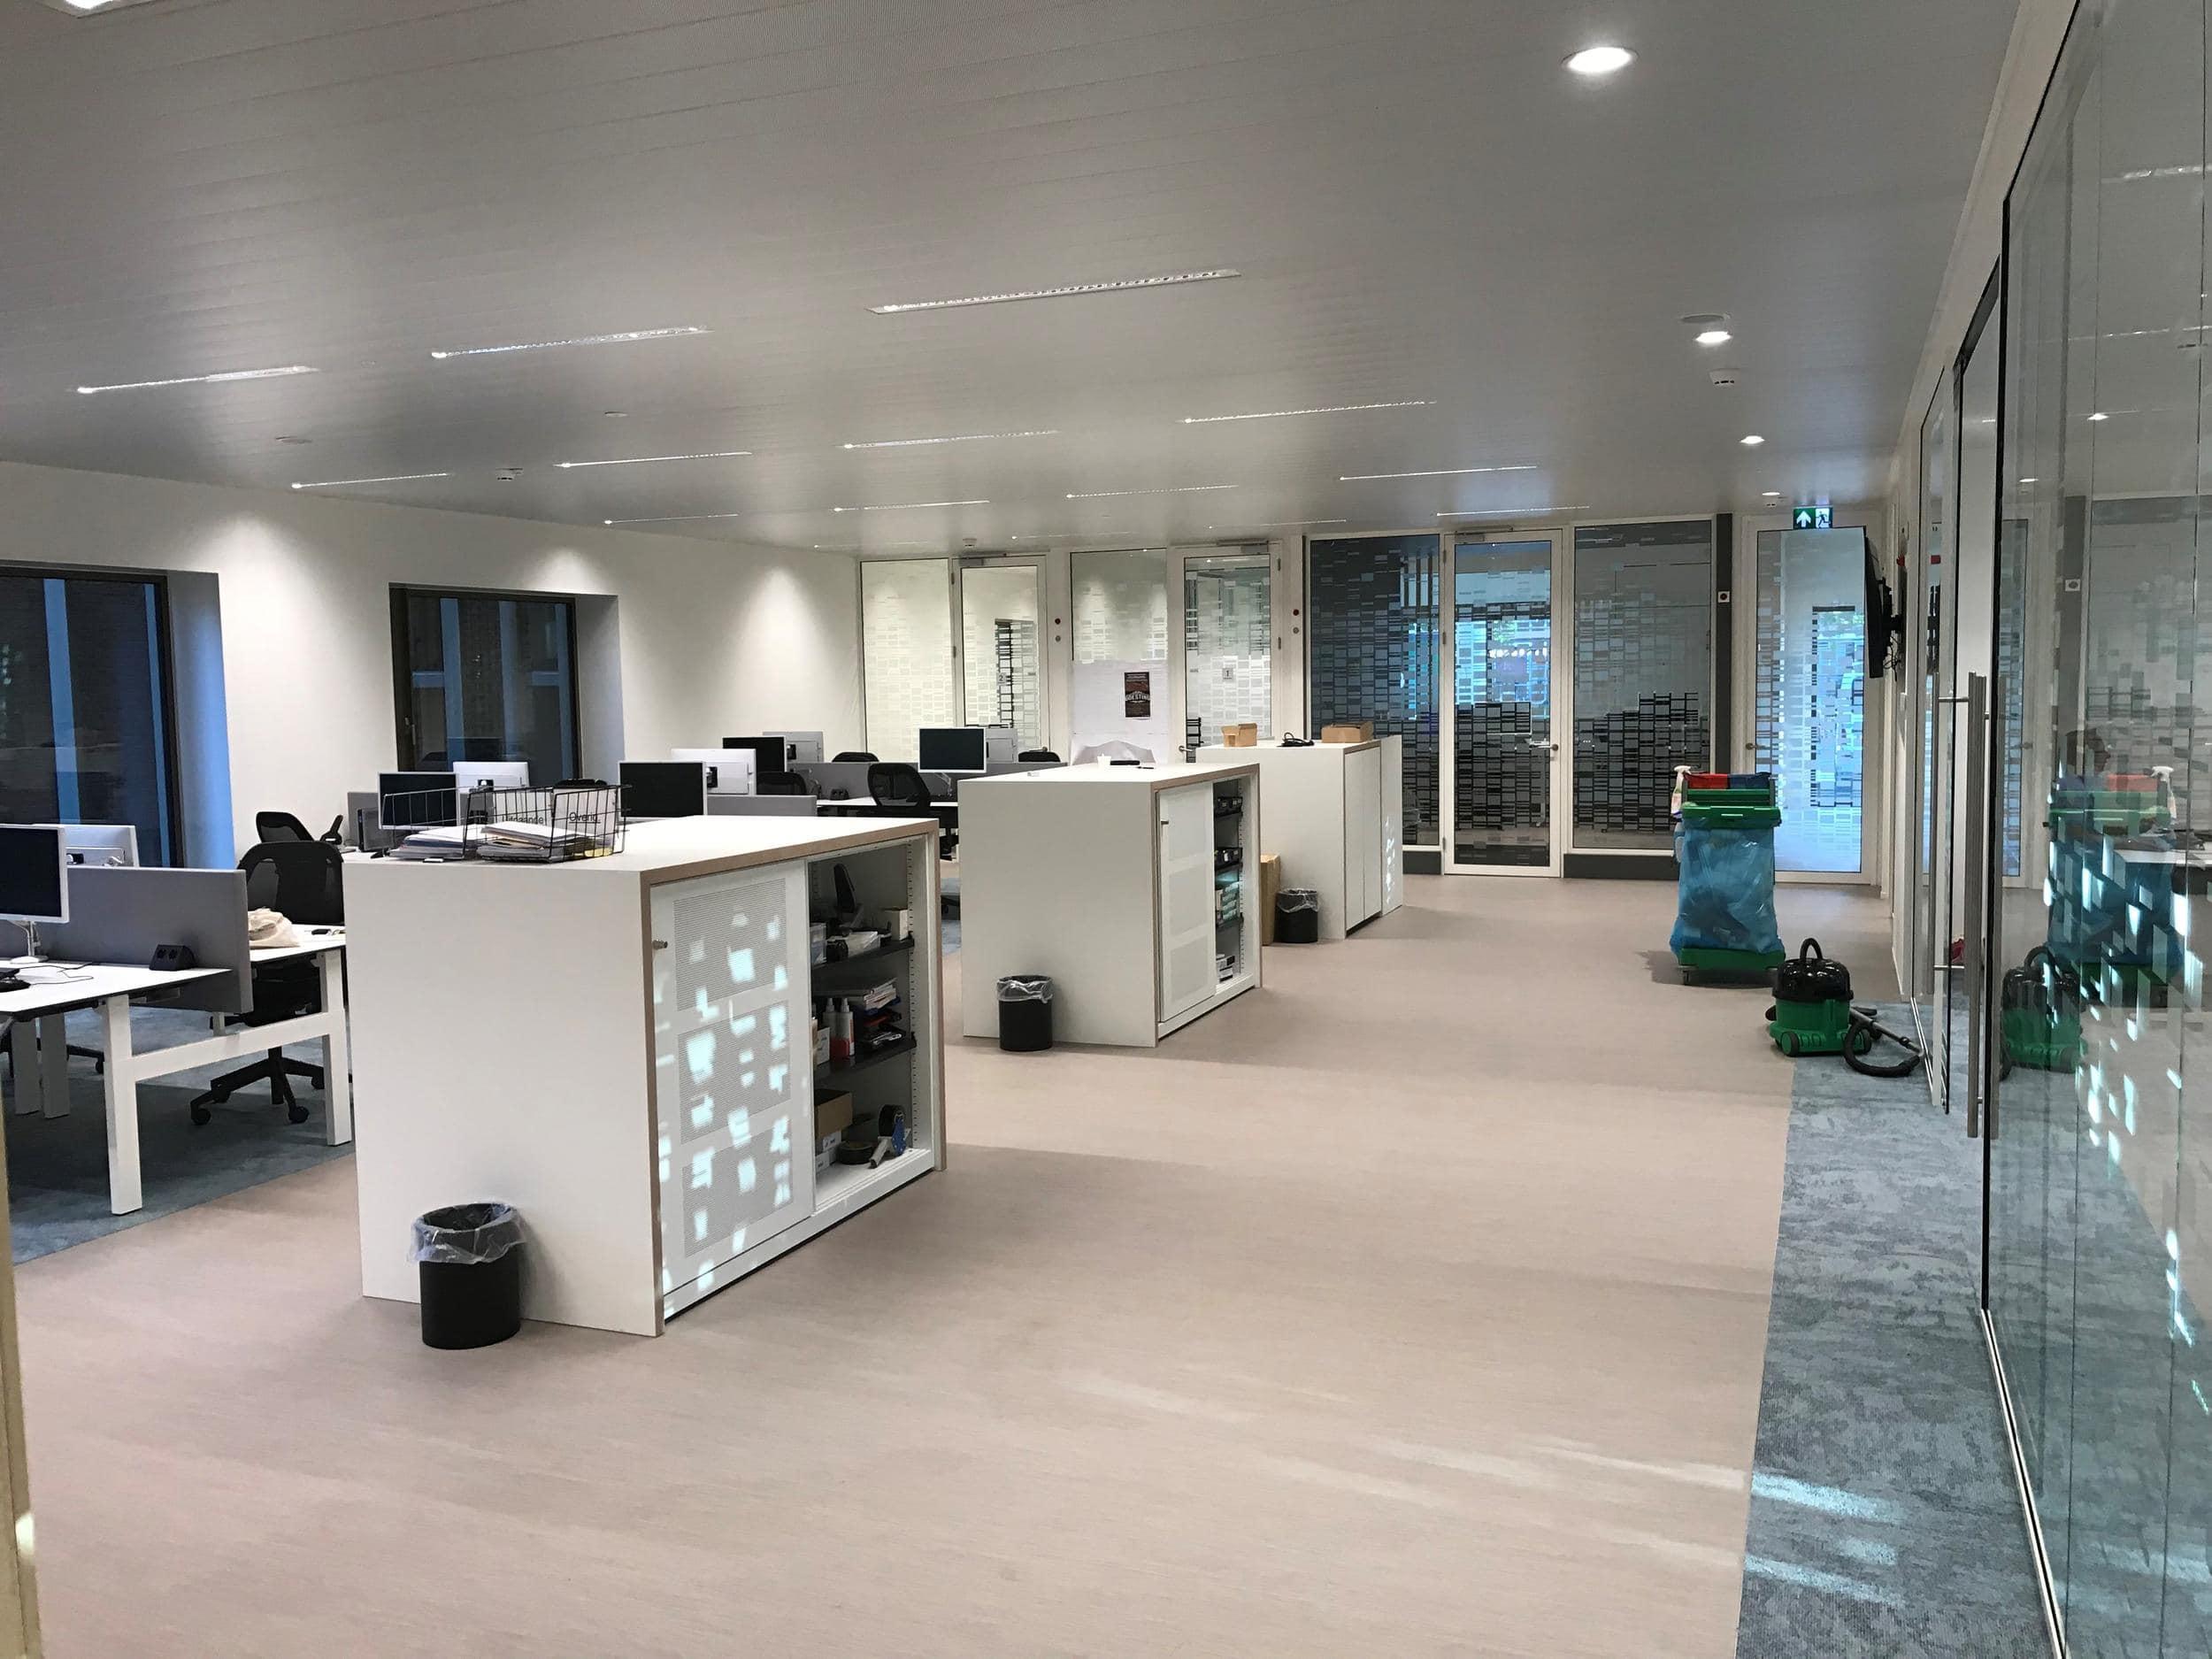 Nieuwbouw politiebureau te Venray kantoor